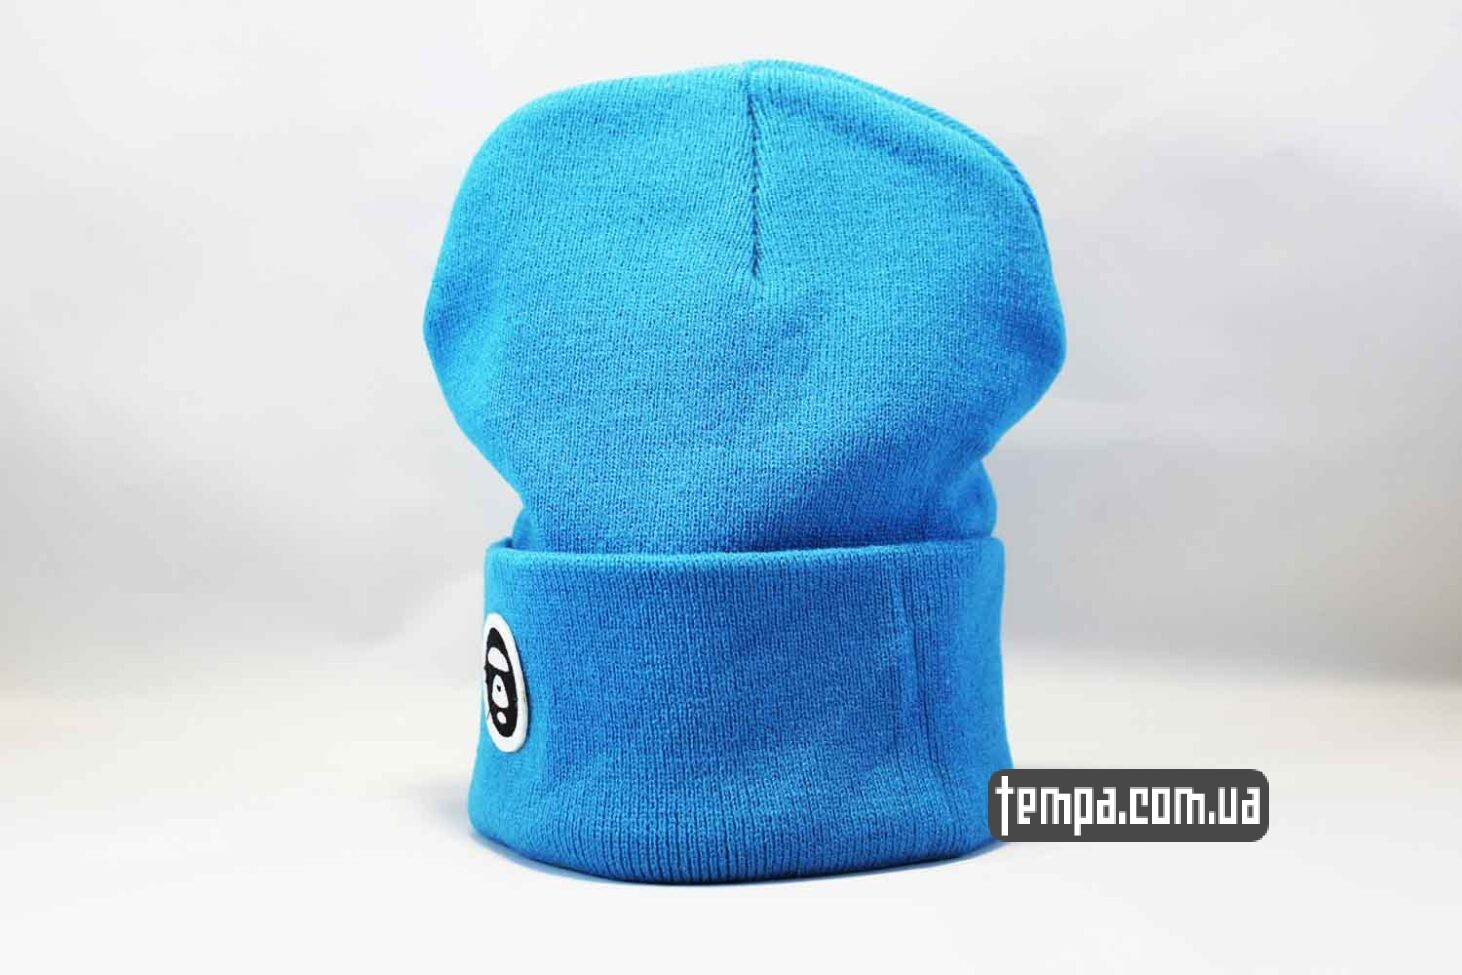 шапка beanie Aape ярко голубая купить Украина